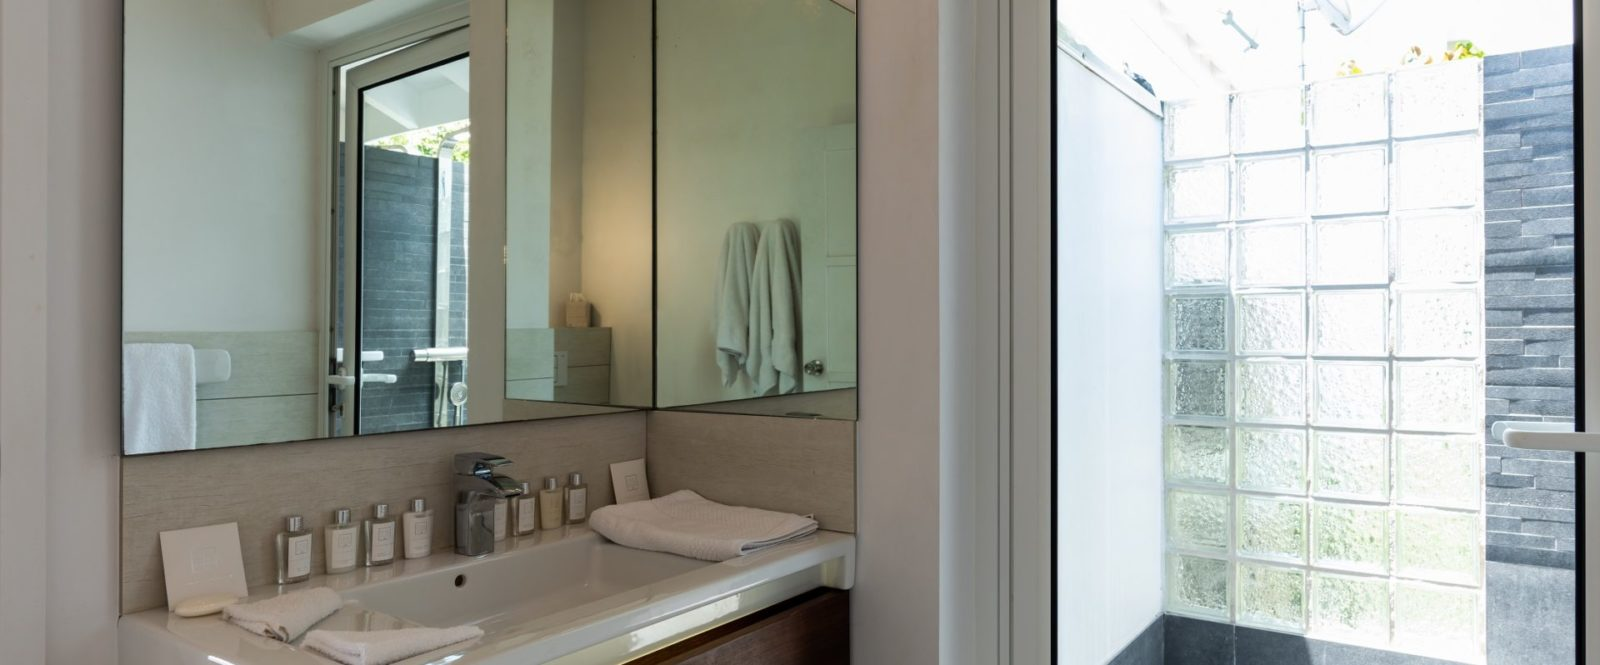 AVALON - villa-avalon-jeanne-le-menn-bedroom-2-3